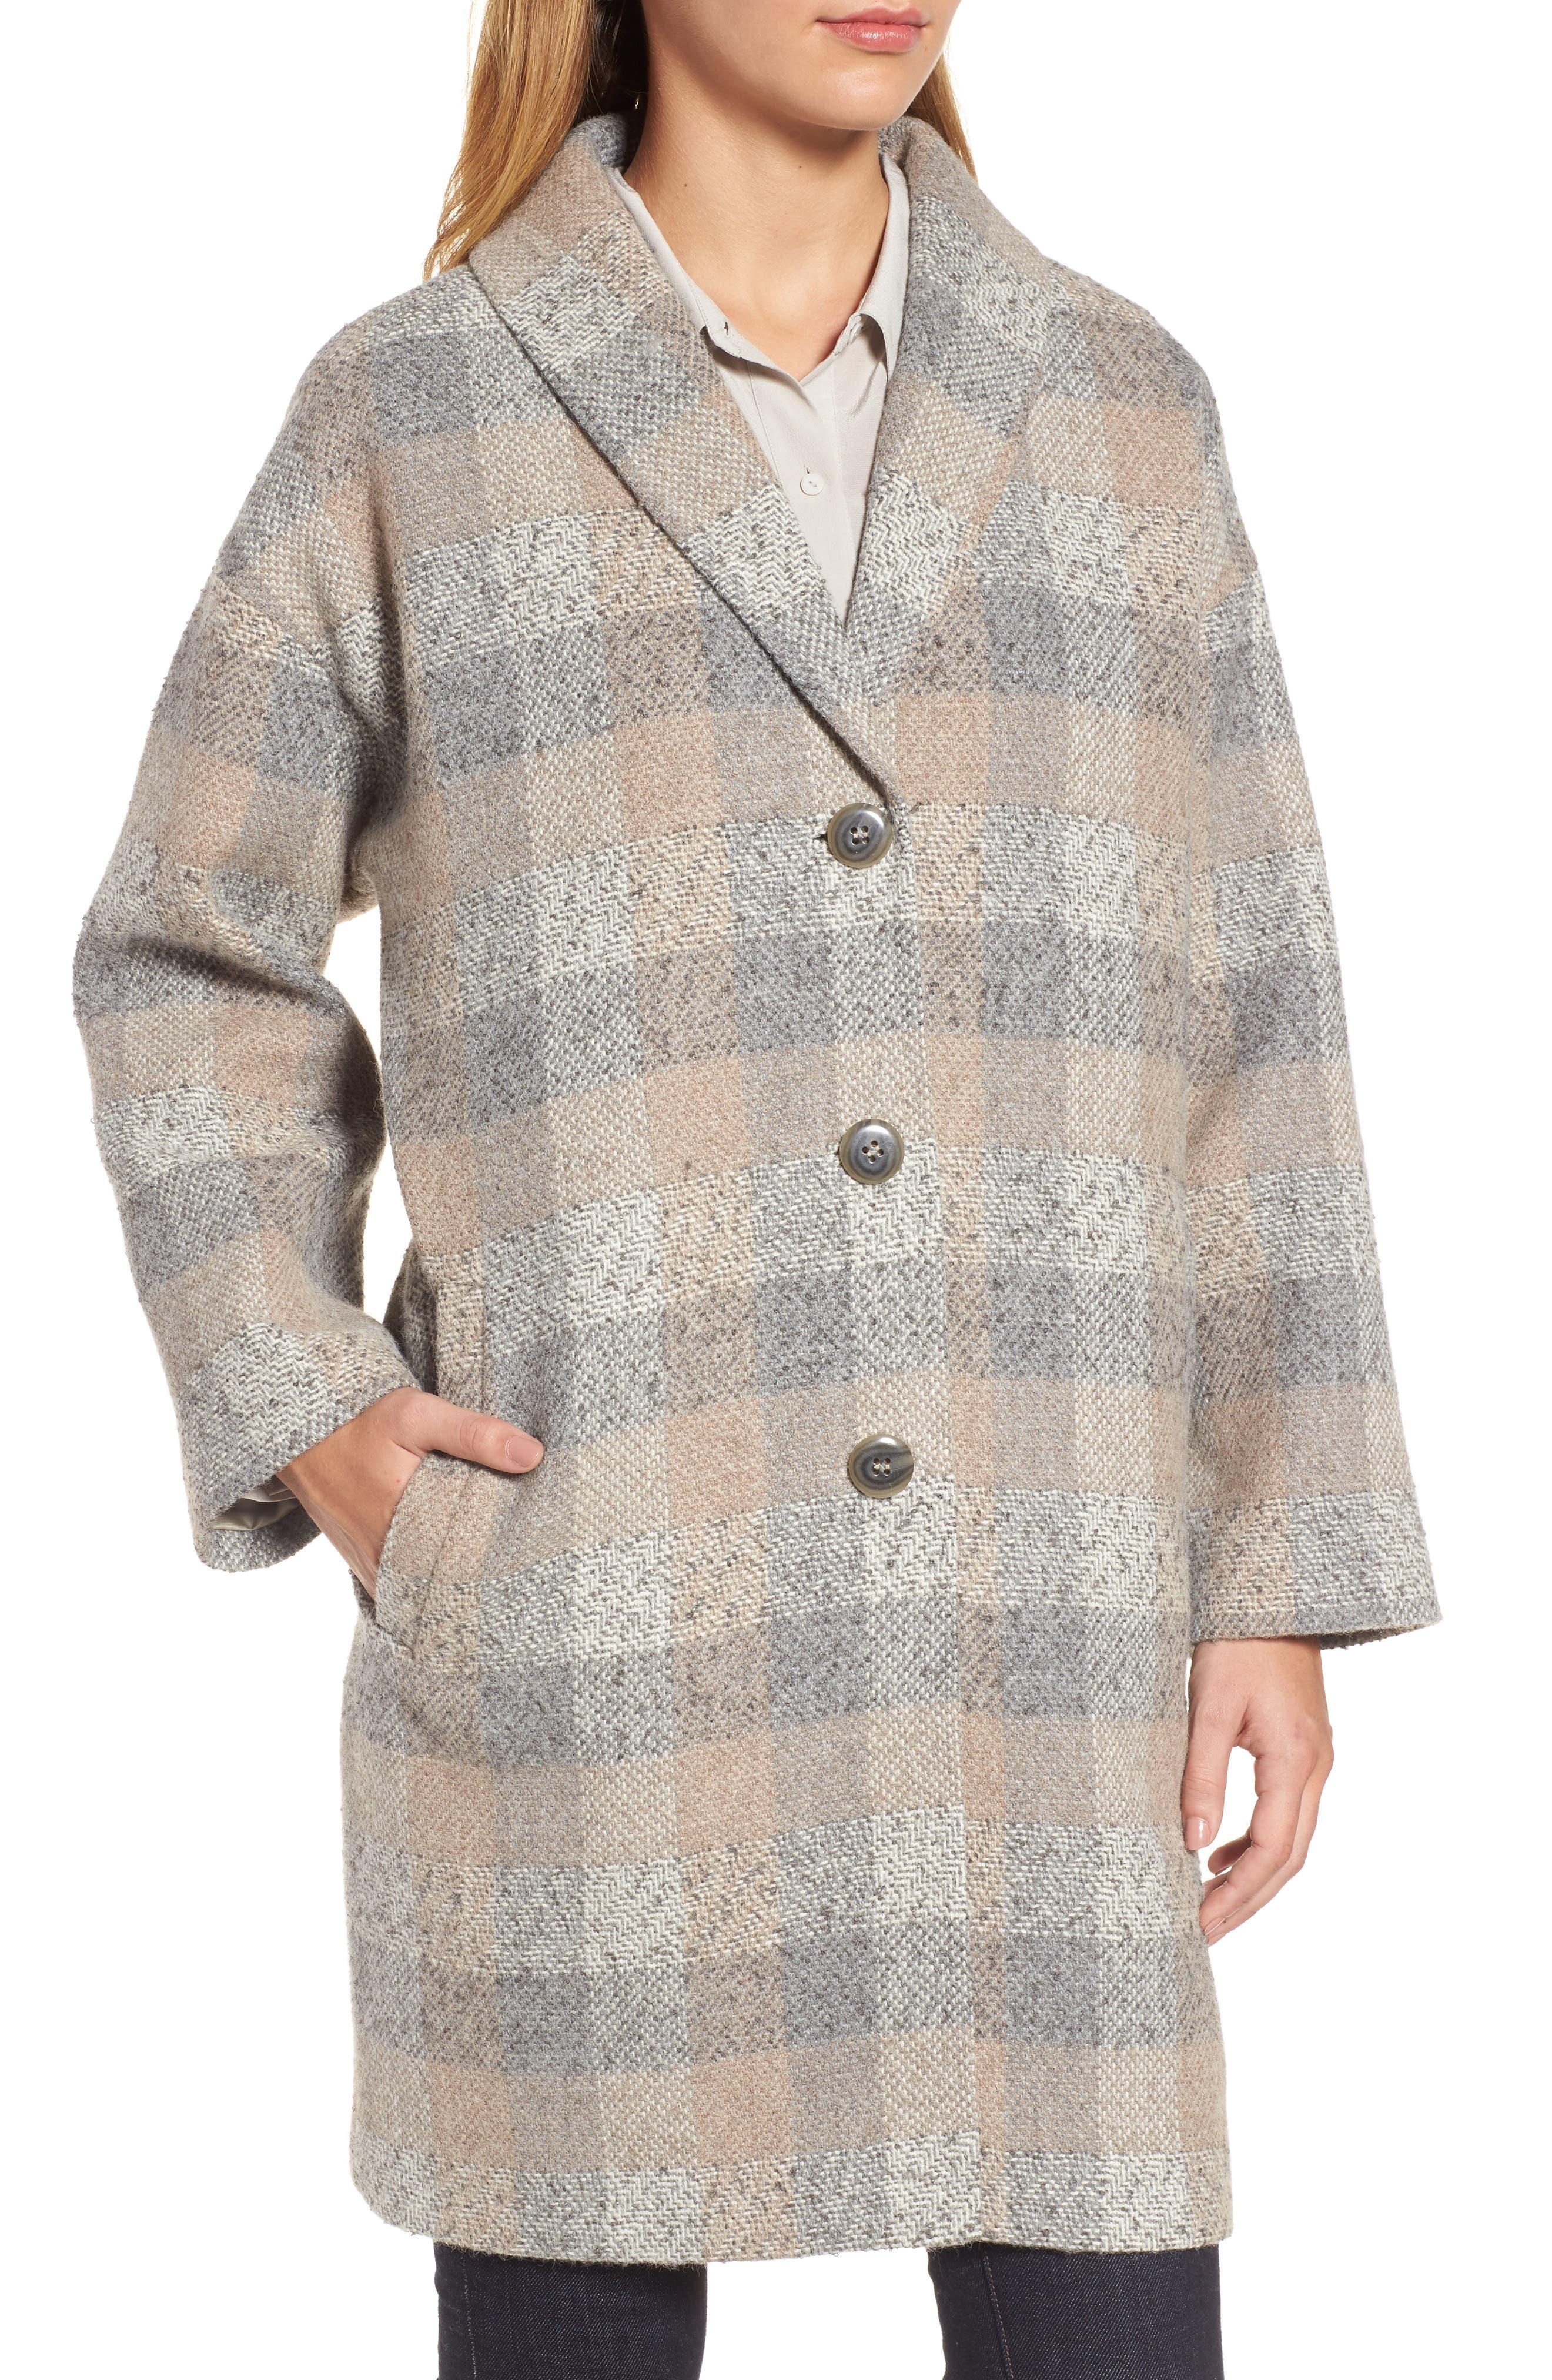 Plaid Alpaca Blend Coat,                             Alternate thumbnail 4, color,                             Dark Pearl